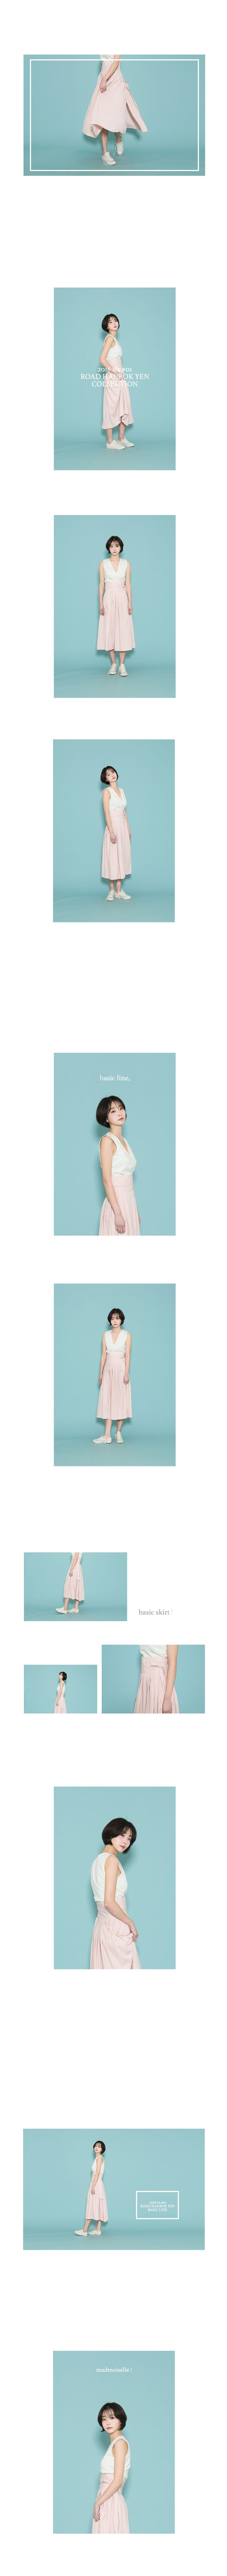 "#hanbok ""rose quartz"" skirt 장미 허리치마_로즈쿼츠"